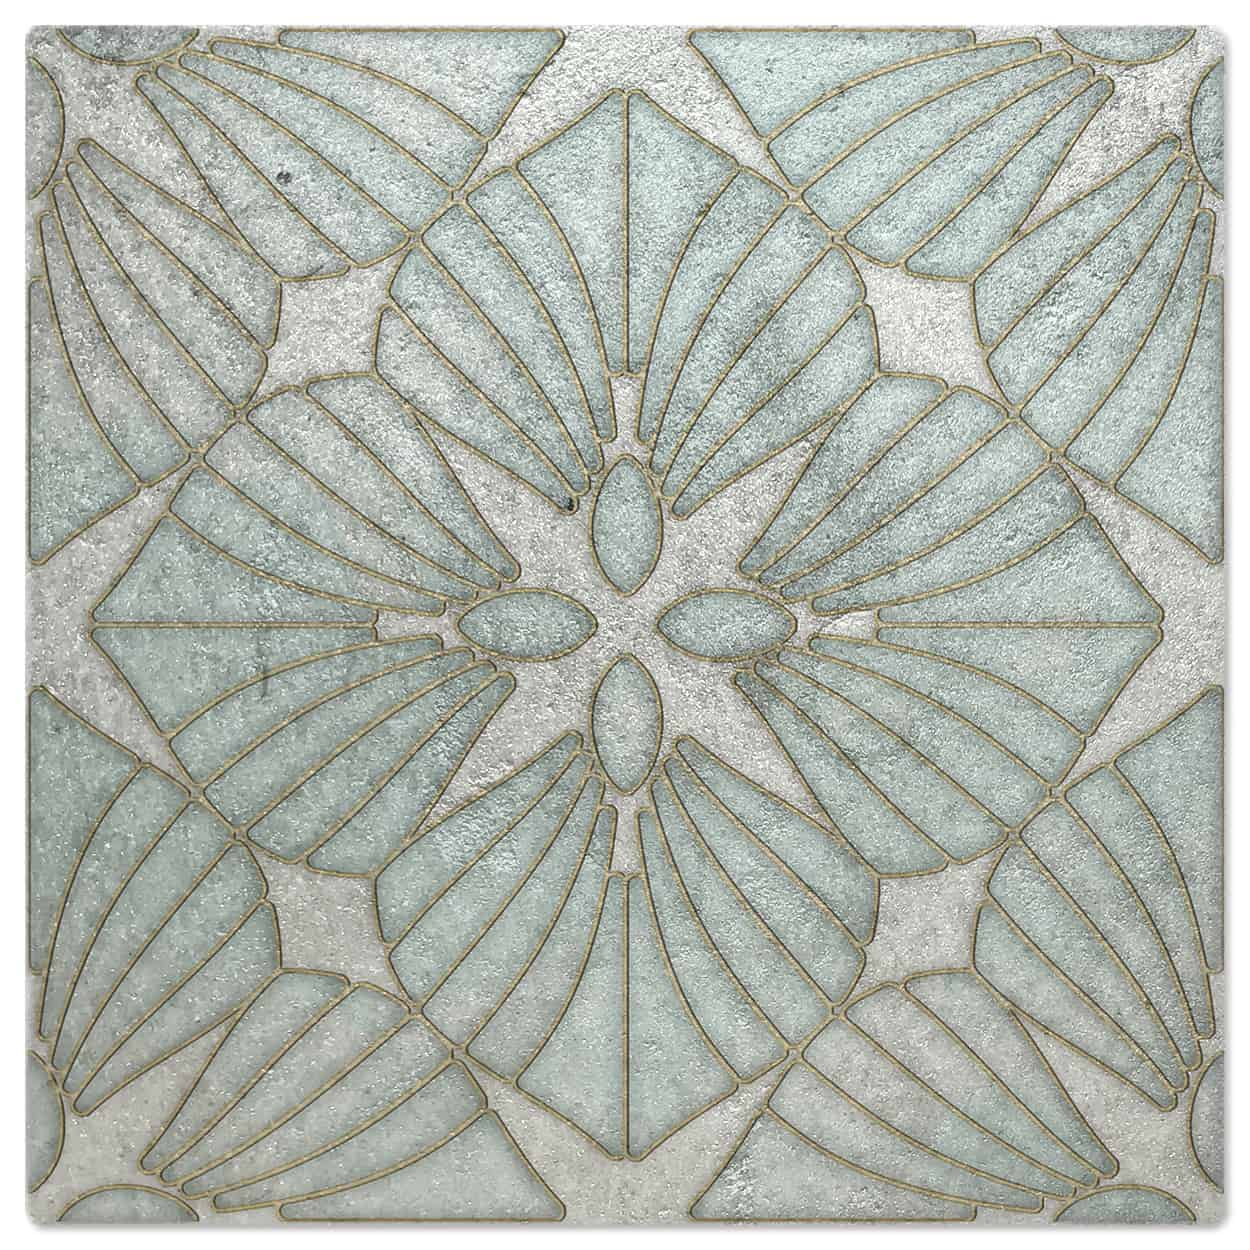 D'Orsay Aquamarine Luster Pattern Tile